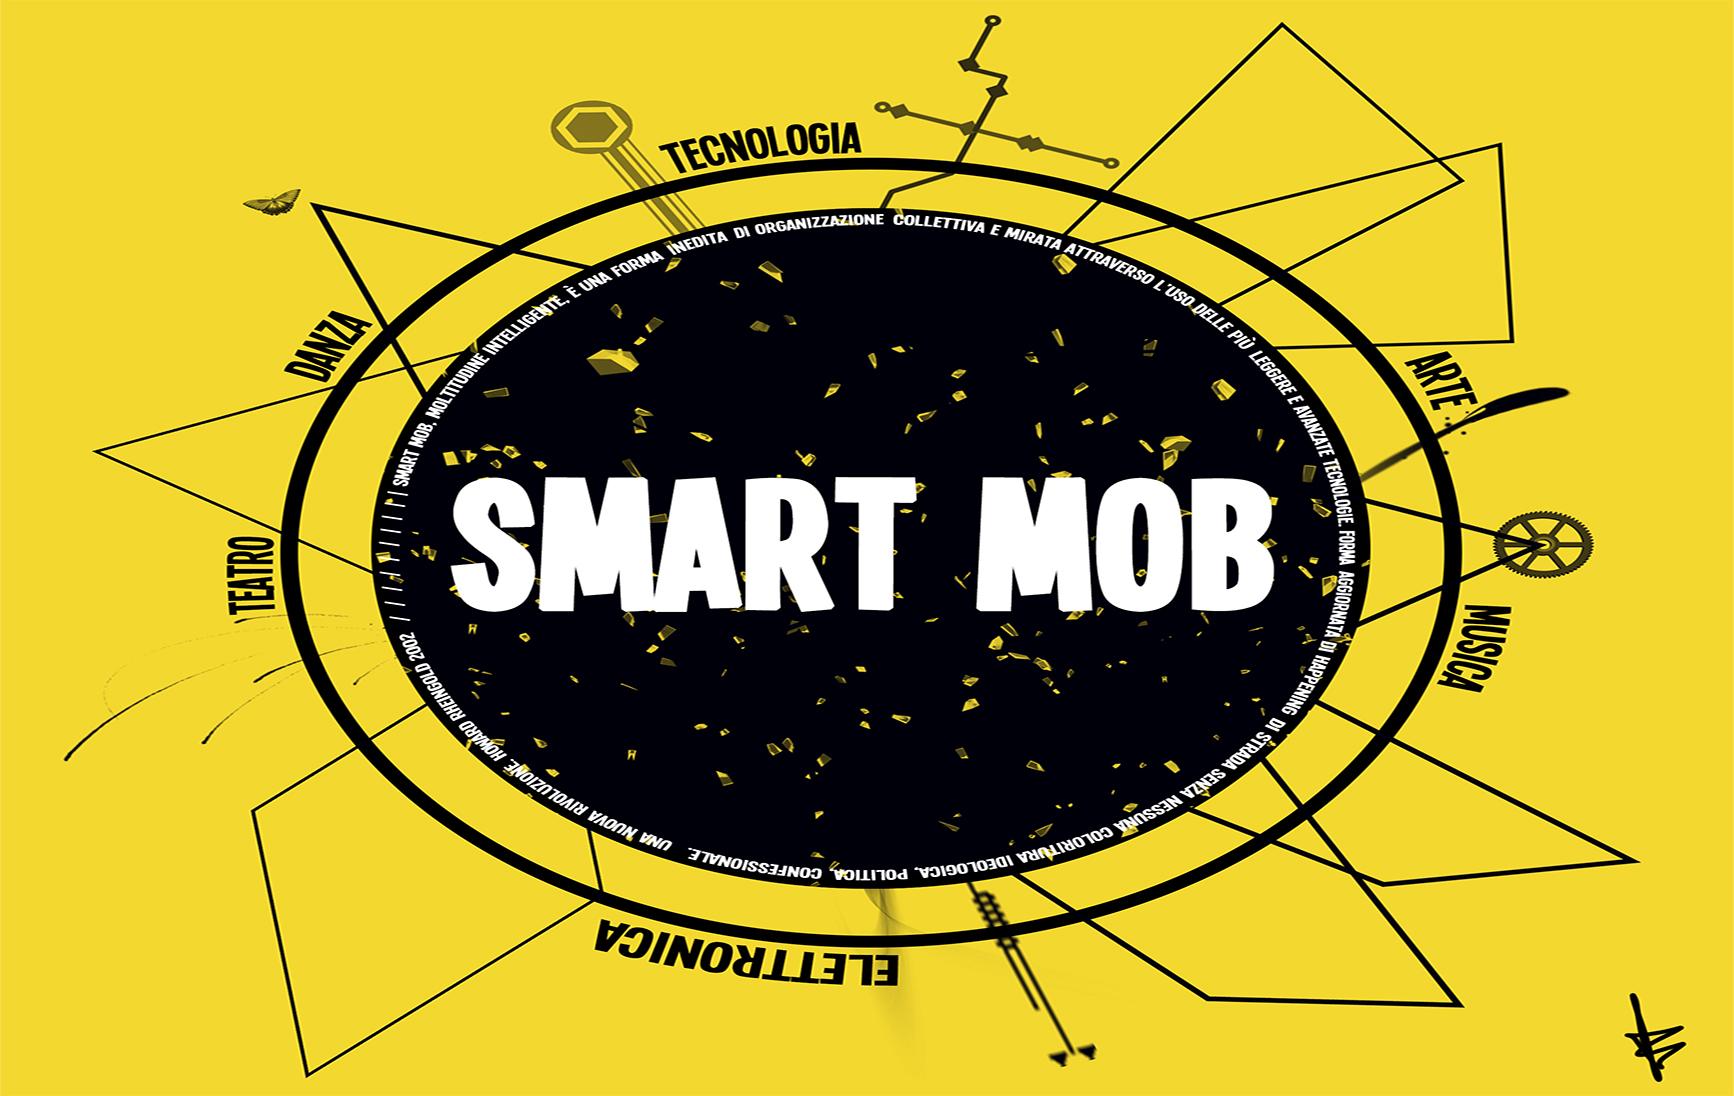 SmartMob – 11/07/2016 21.45 Cuneo